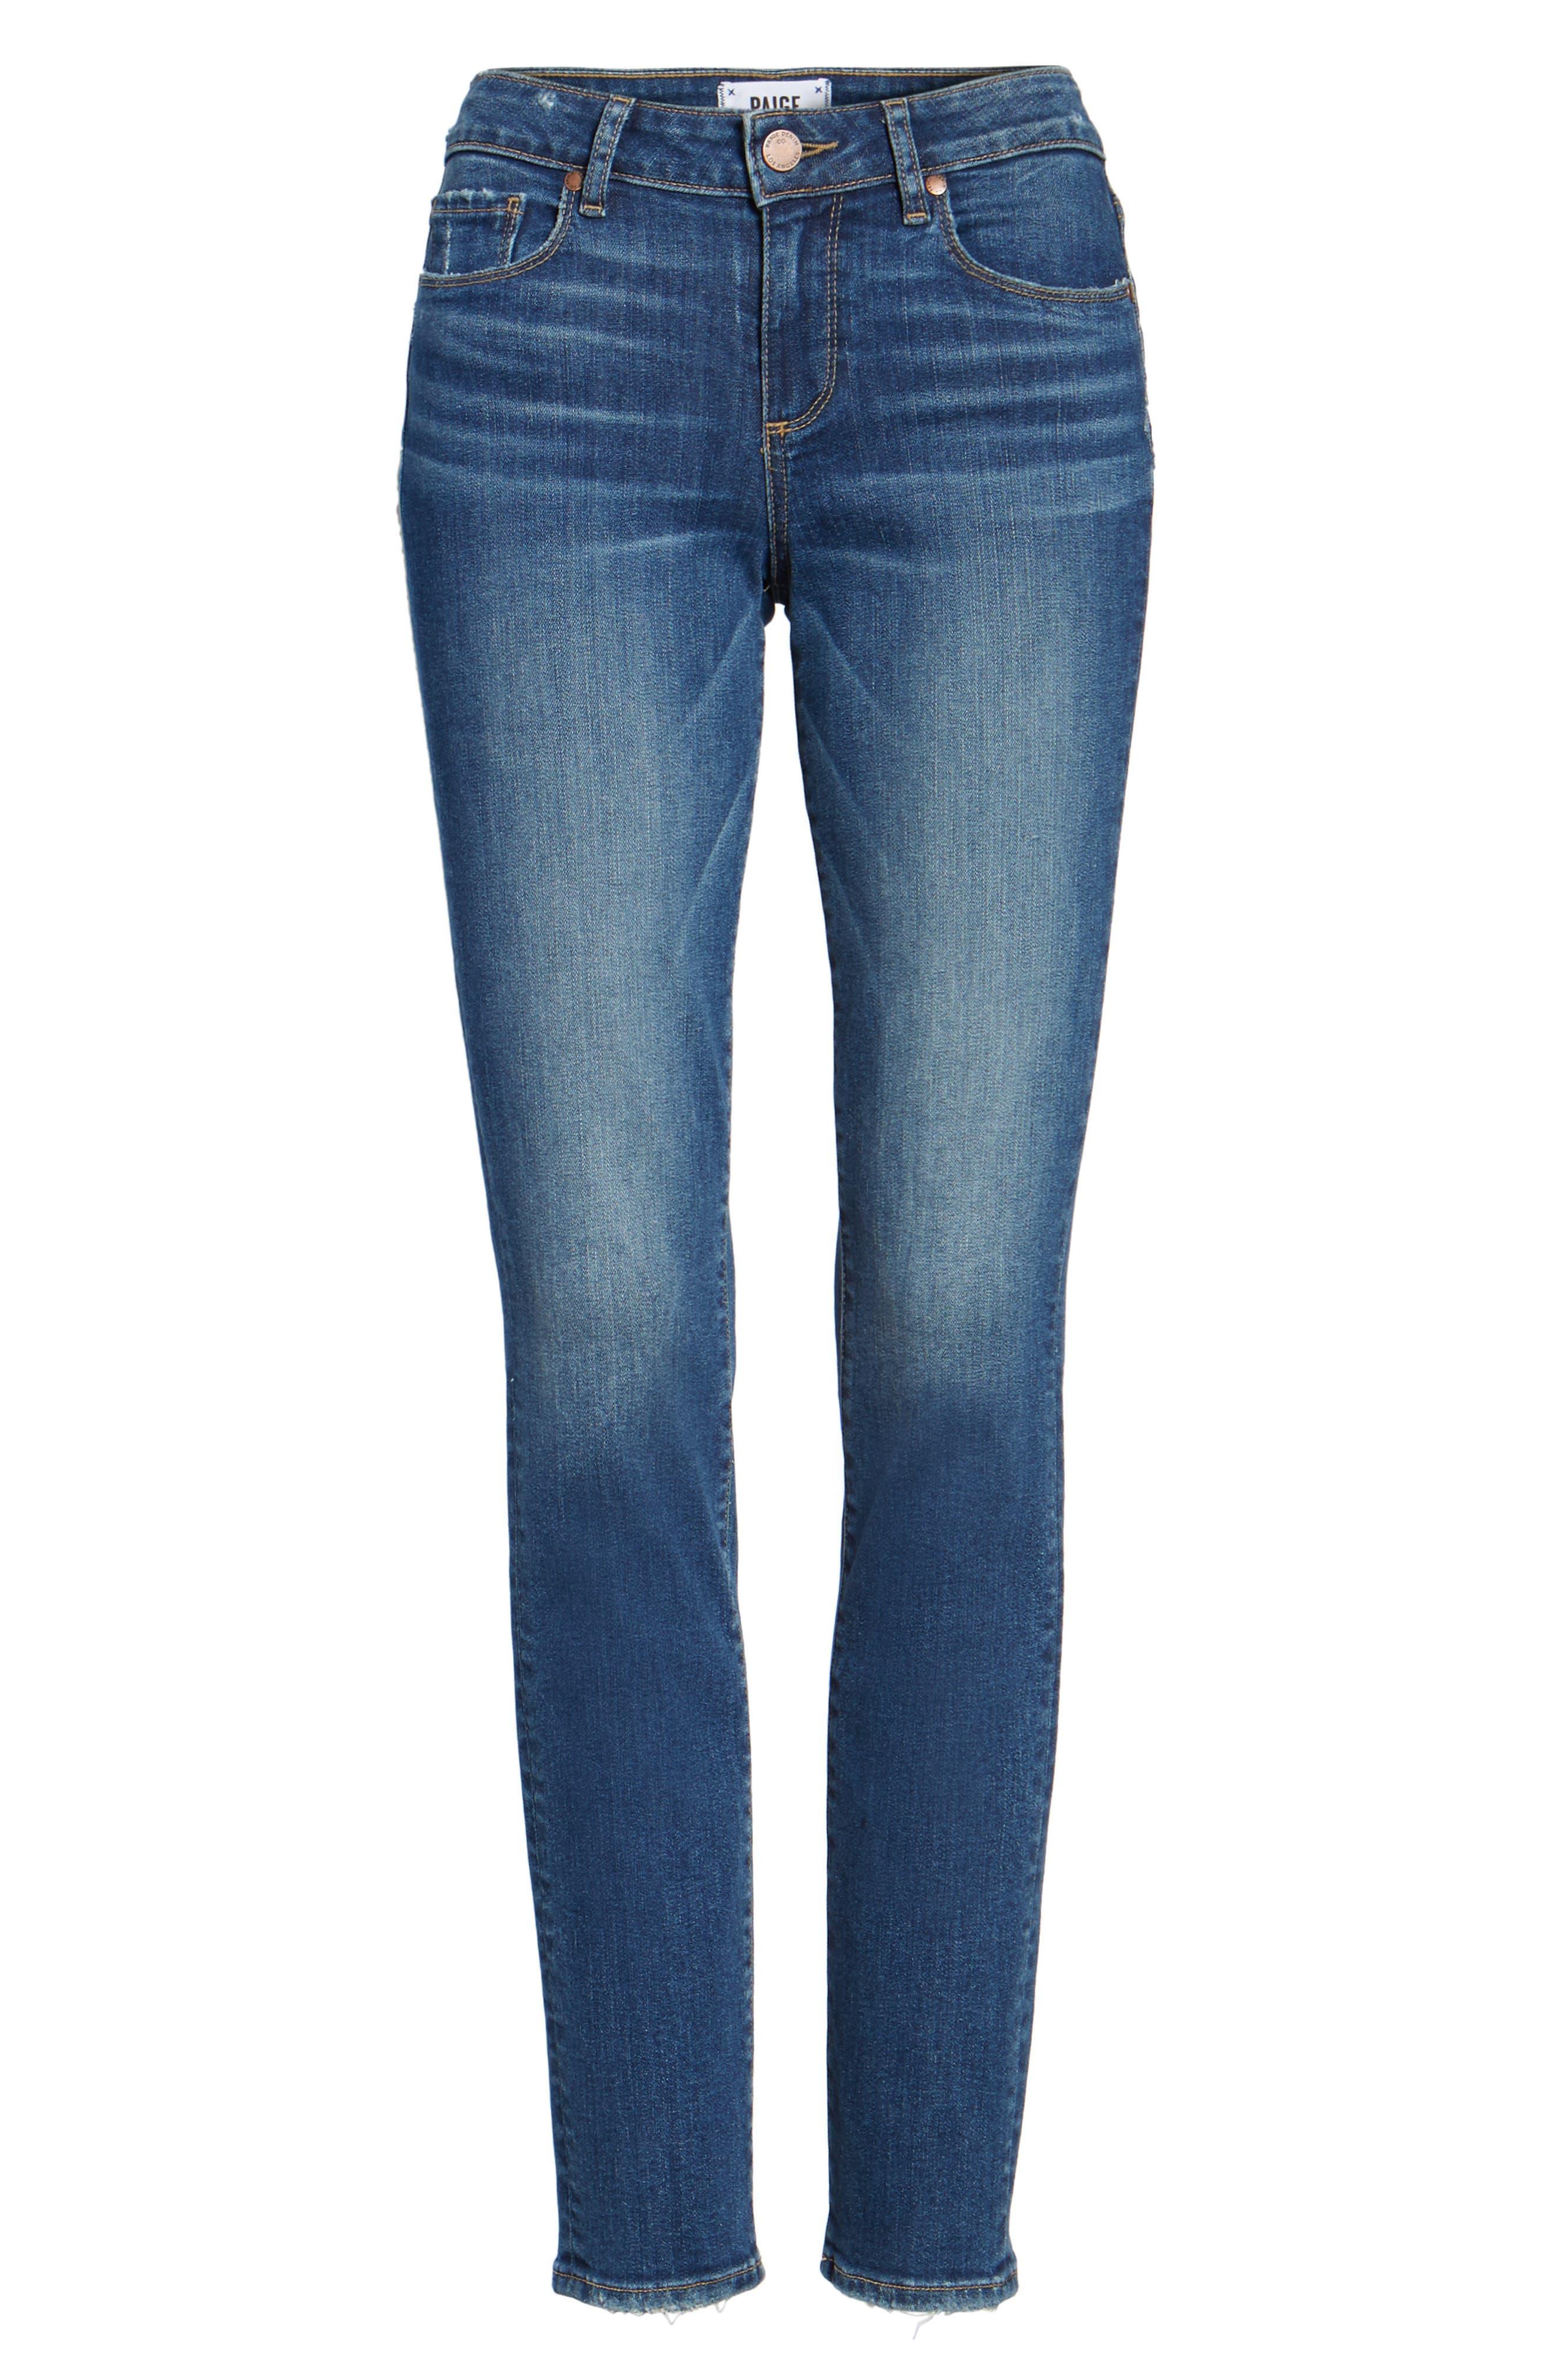 Skyline Skinny Jeans,                             Alternate thumbnail 7, color,                             400